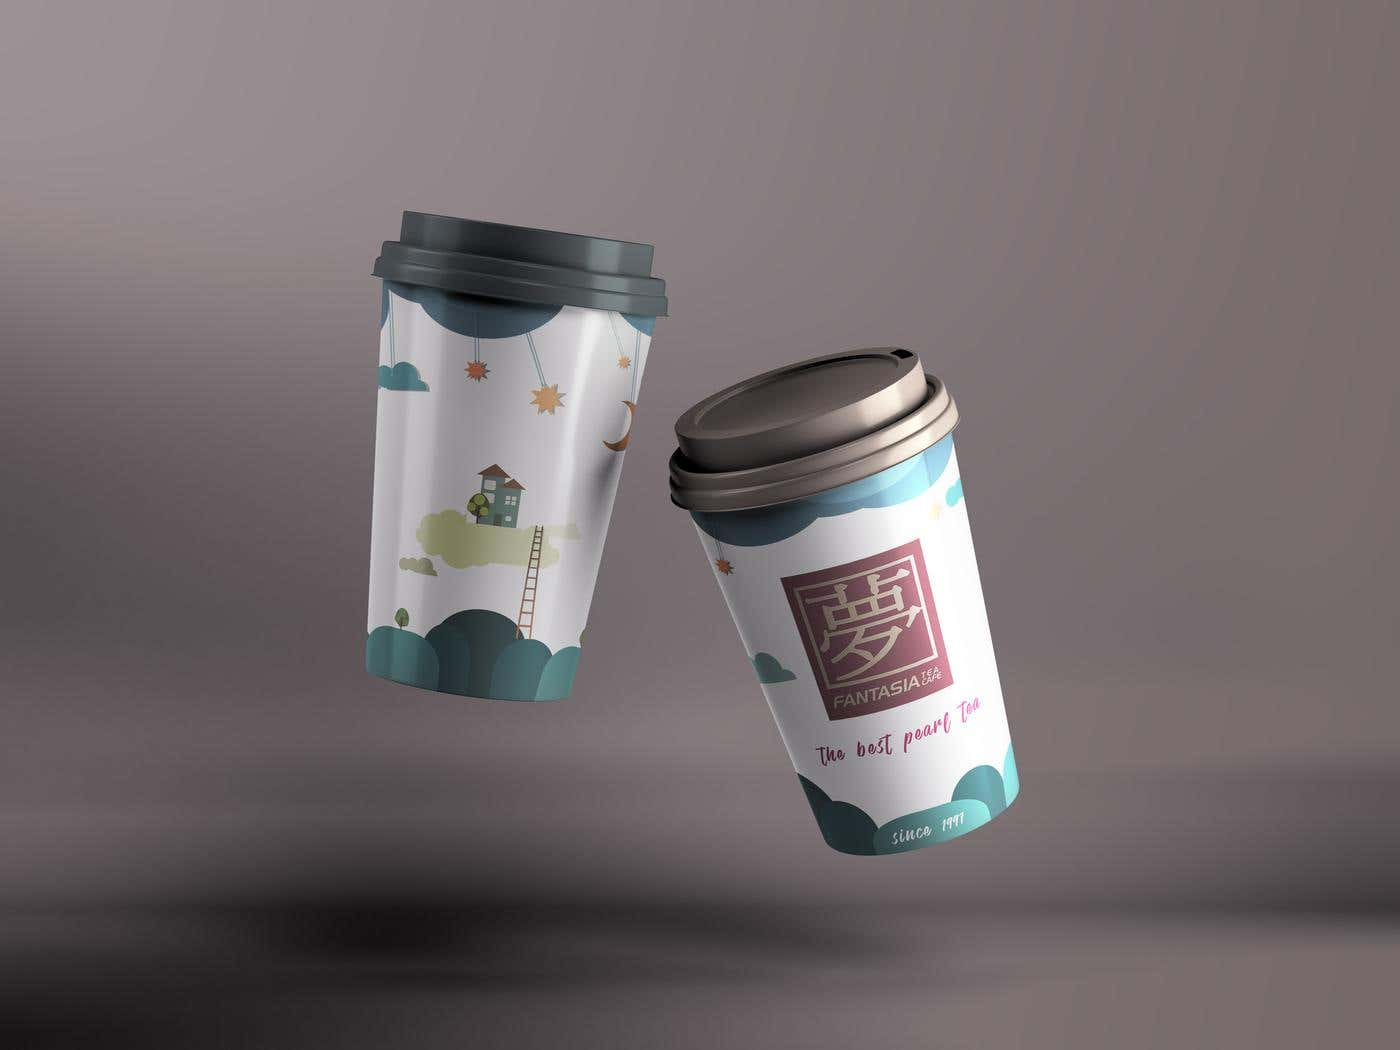 fantasia-tea-cup_2.jpg